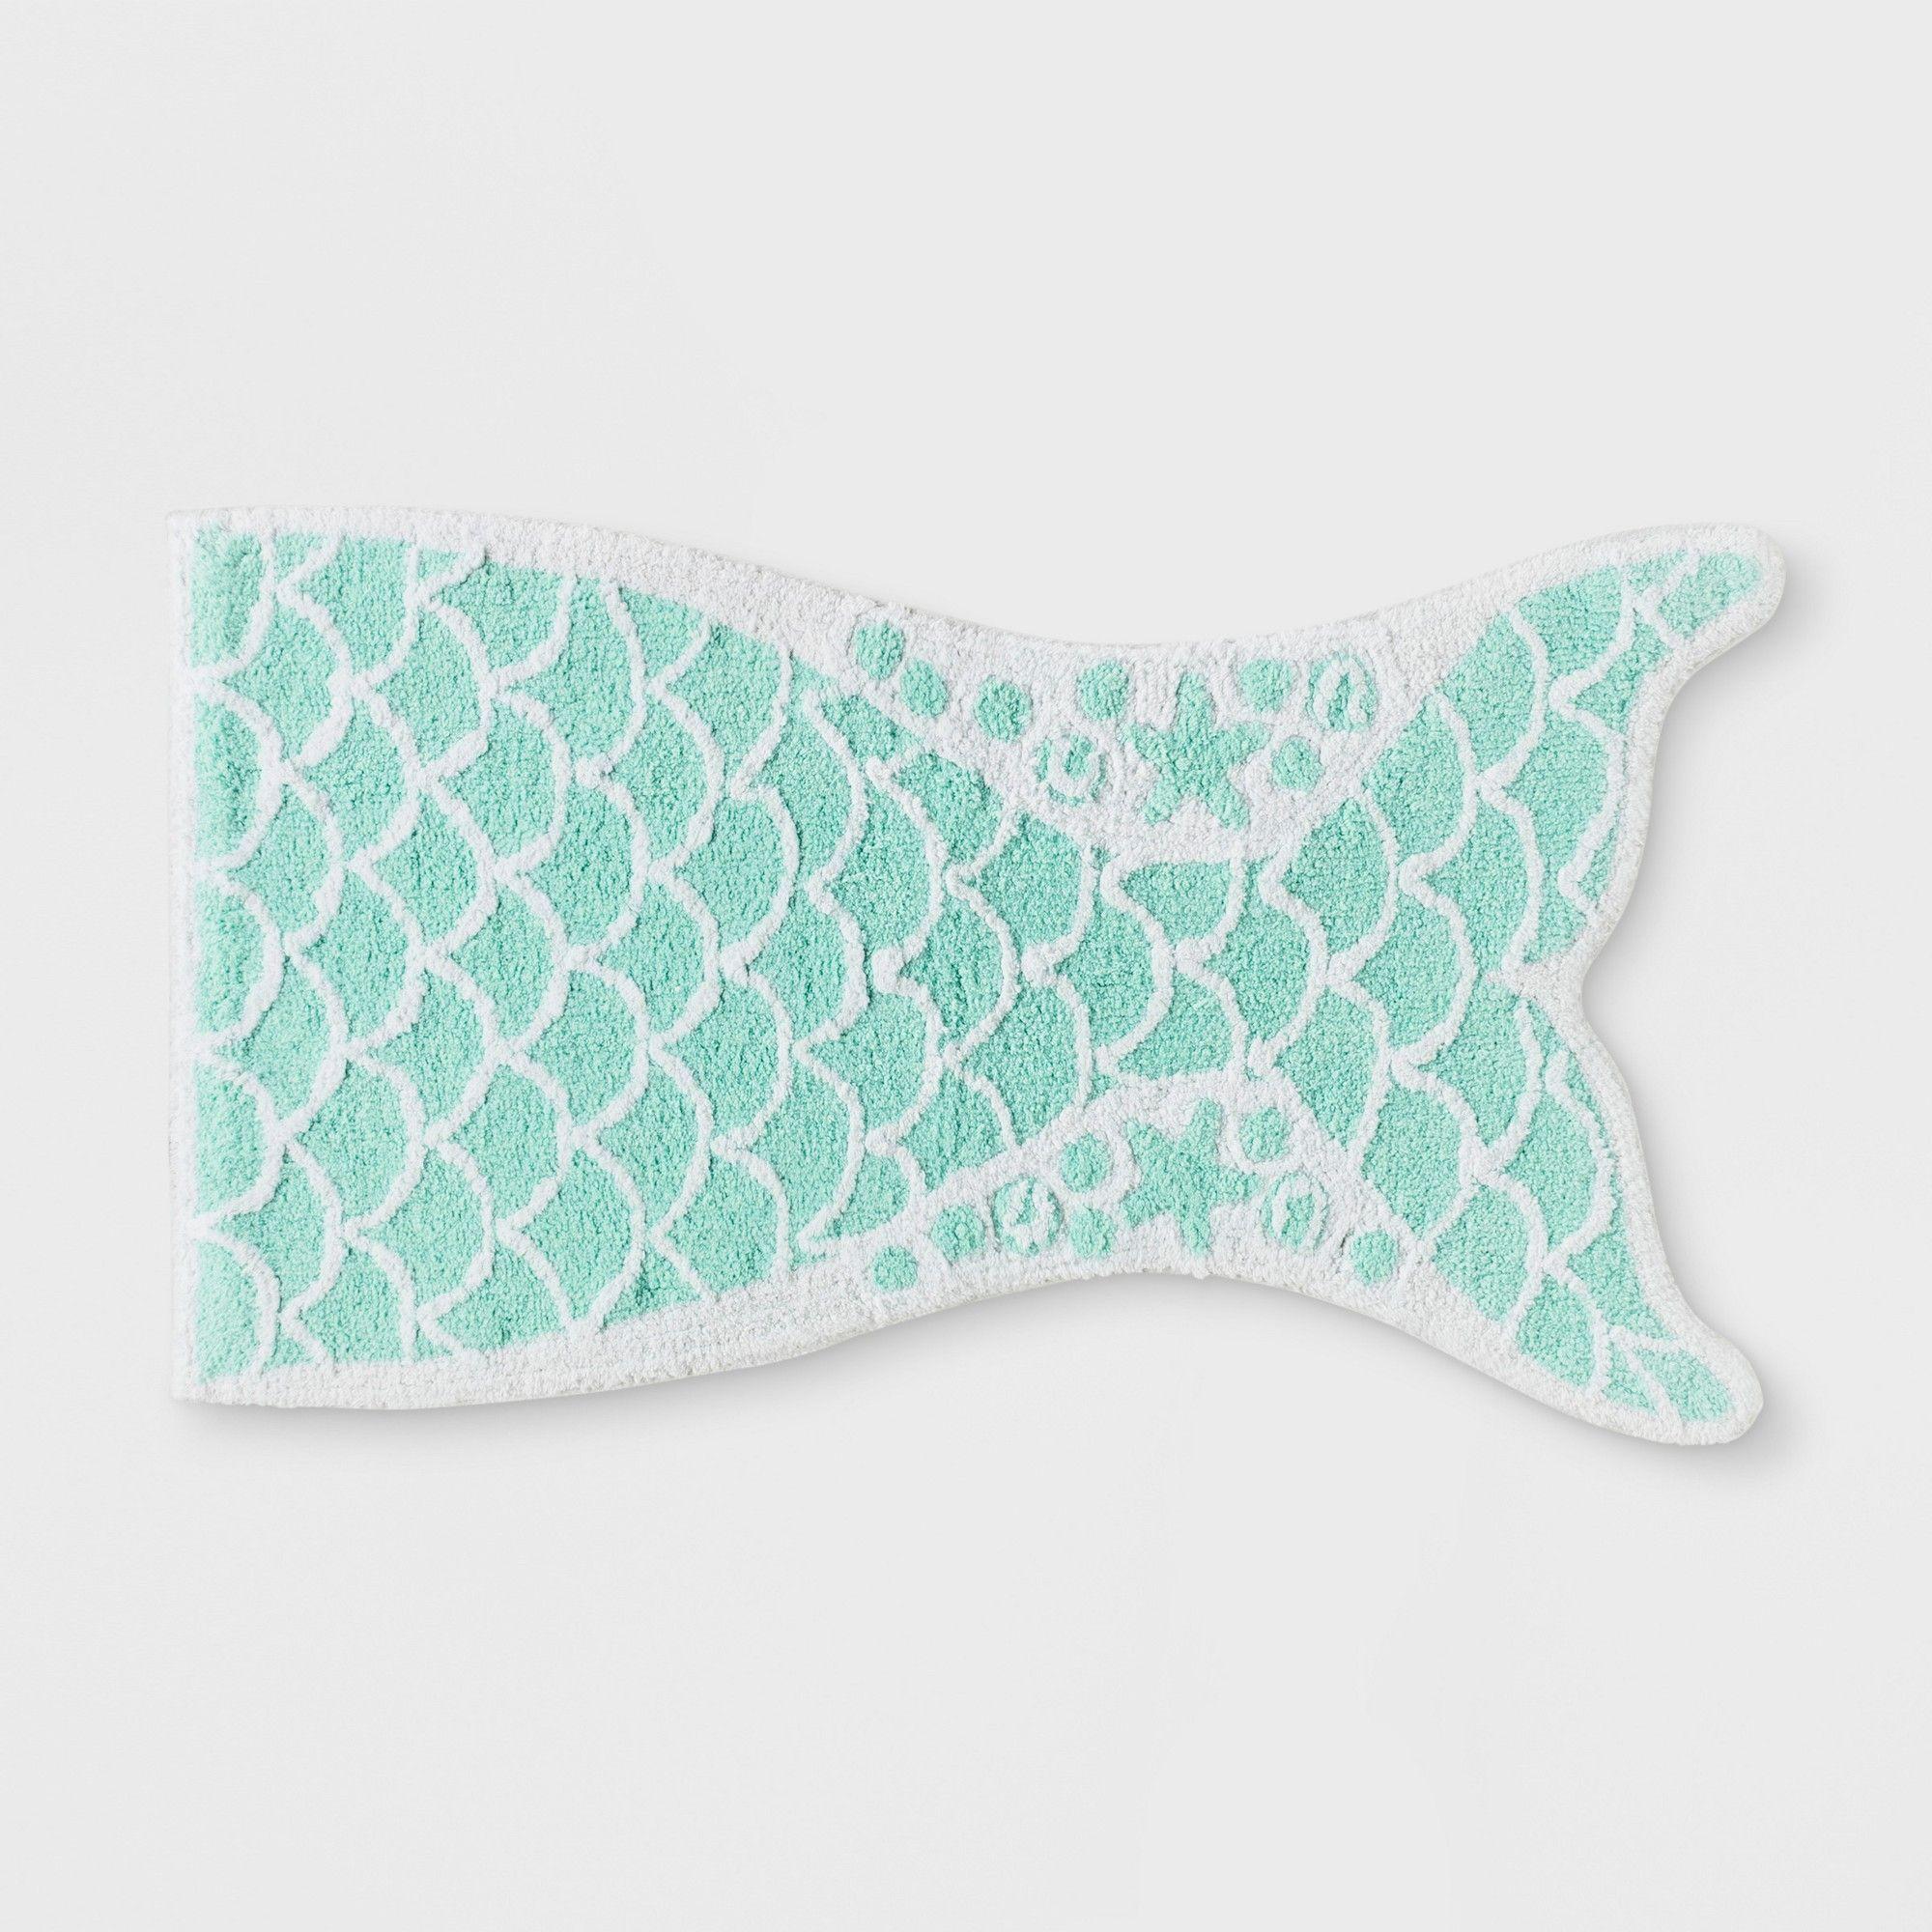 Mermaid Tail Bath Rug Crystalized Green Pillowfort